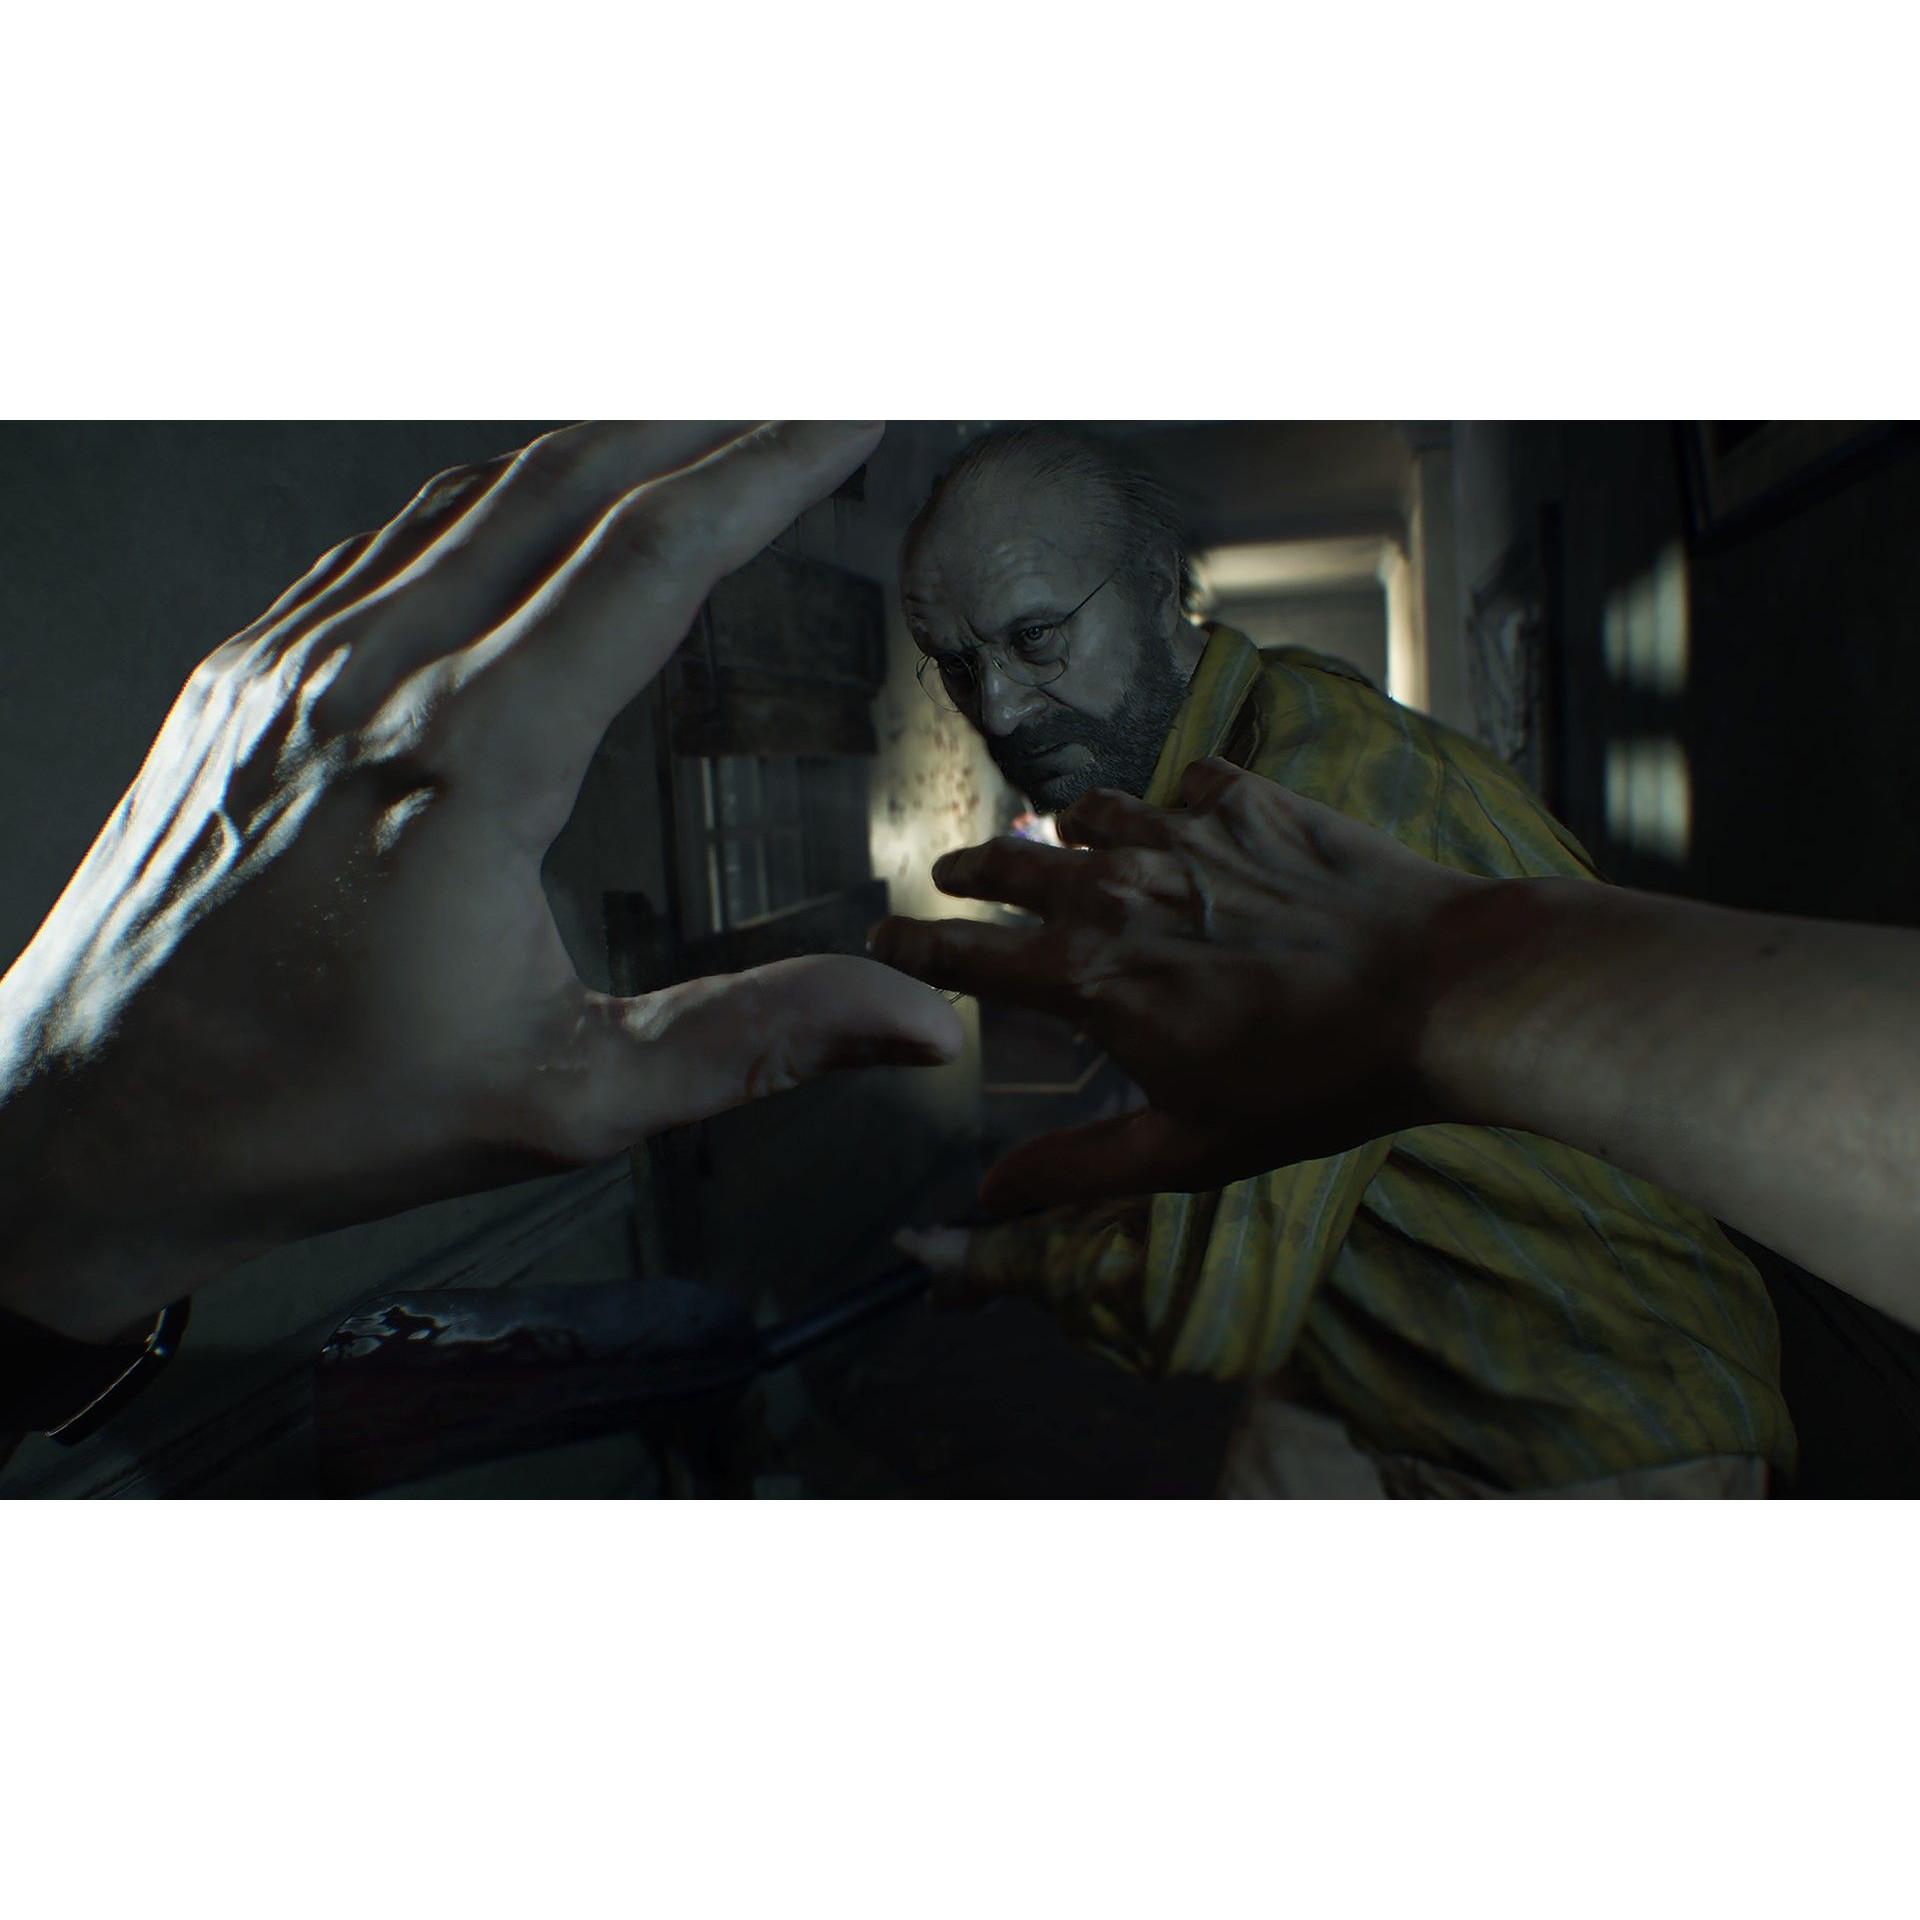 Joc RESIDENT EVIL 7 biohazard BIOHAZARD 7 resident evil Steam Key Pentru Calculator 1